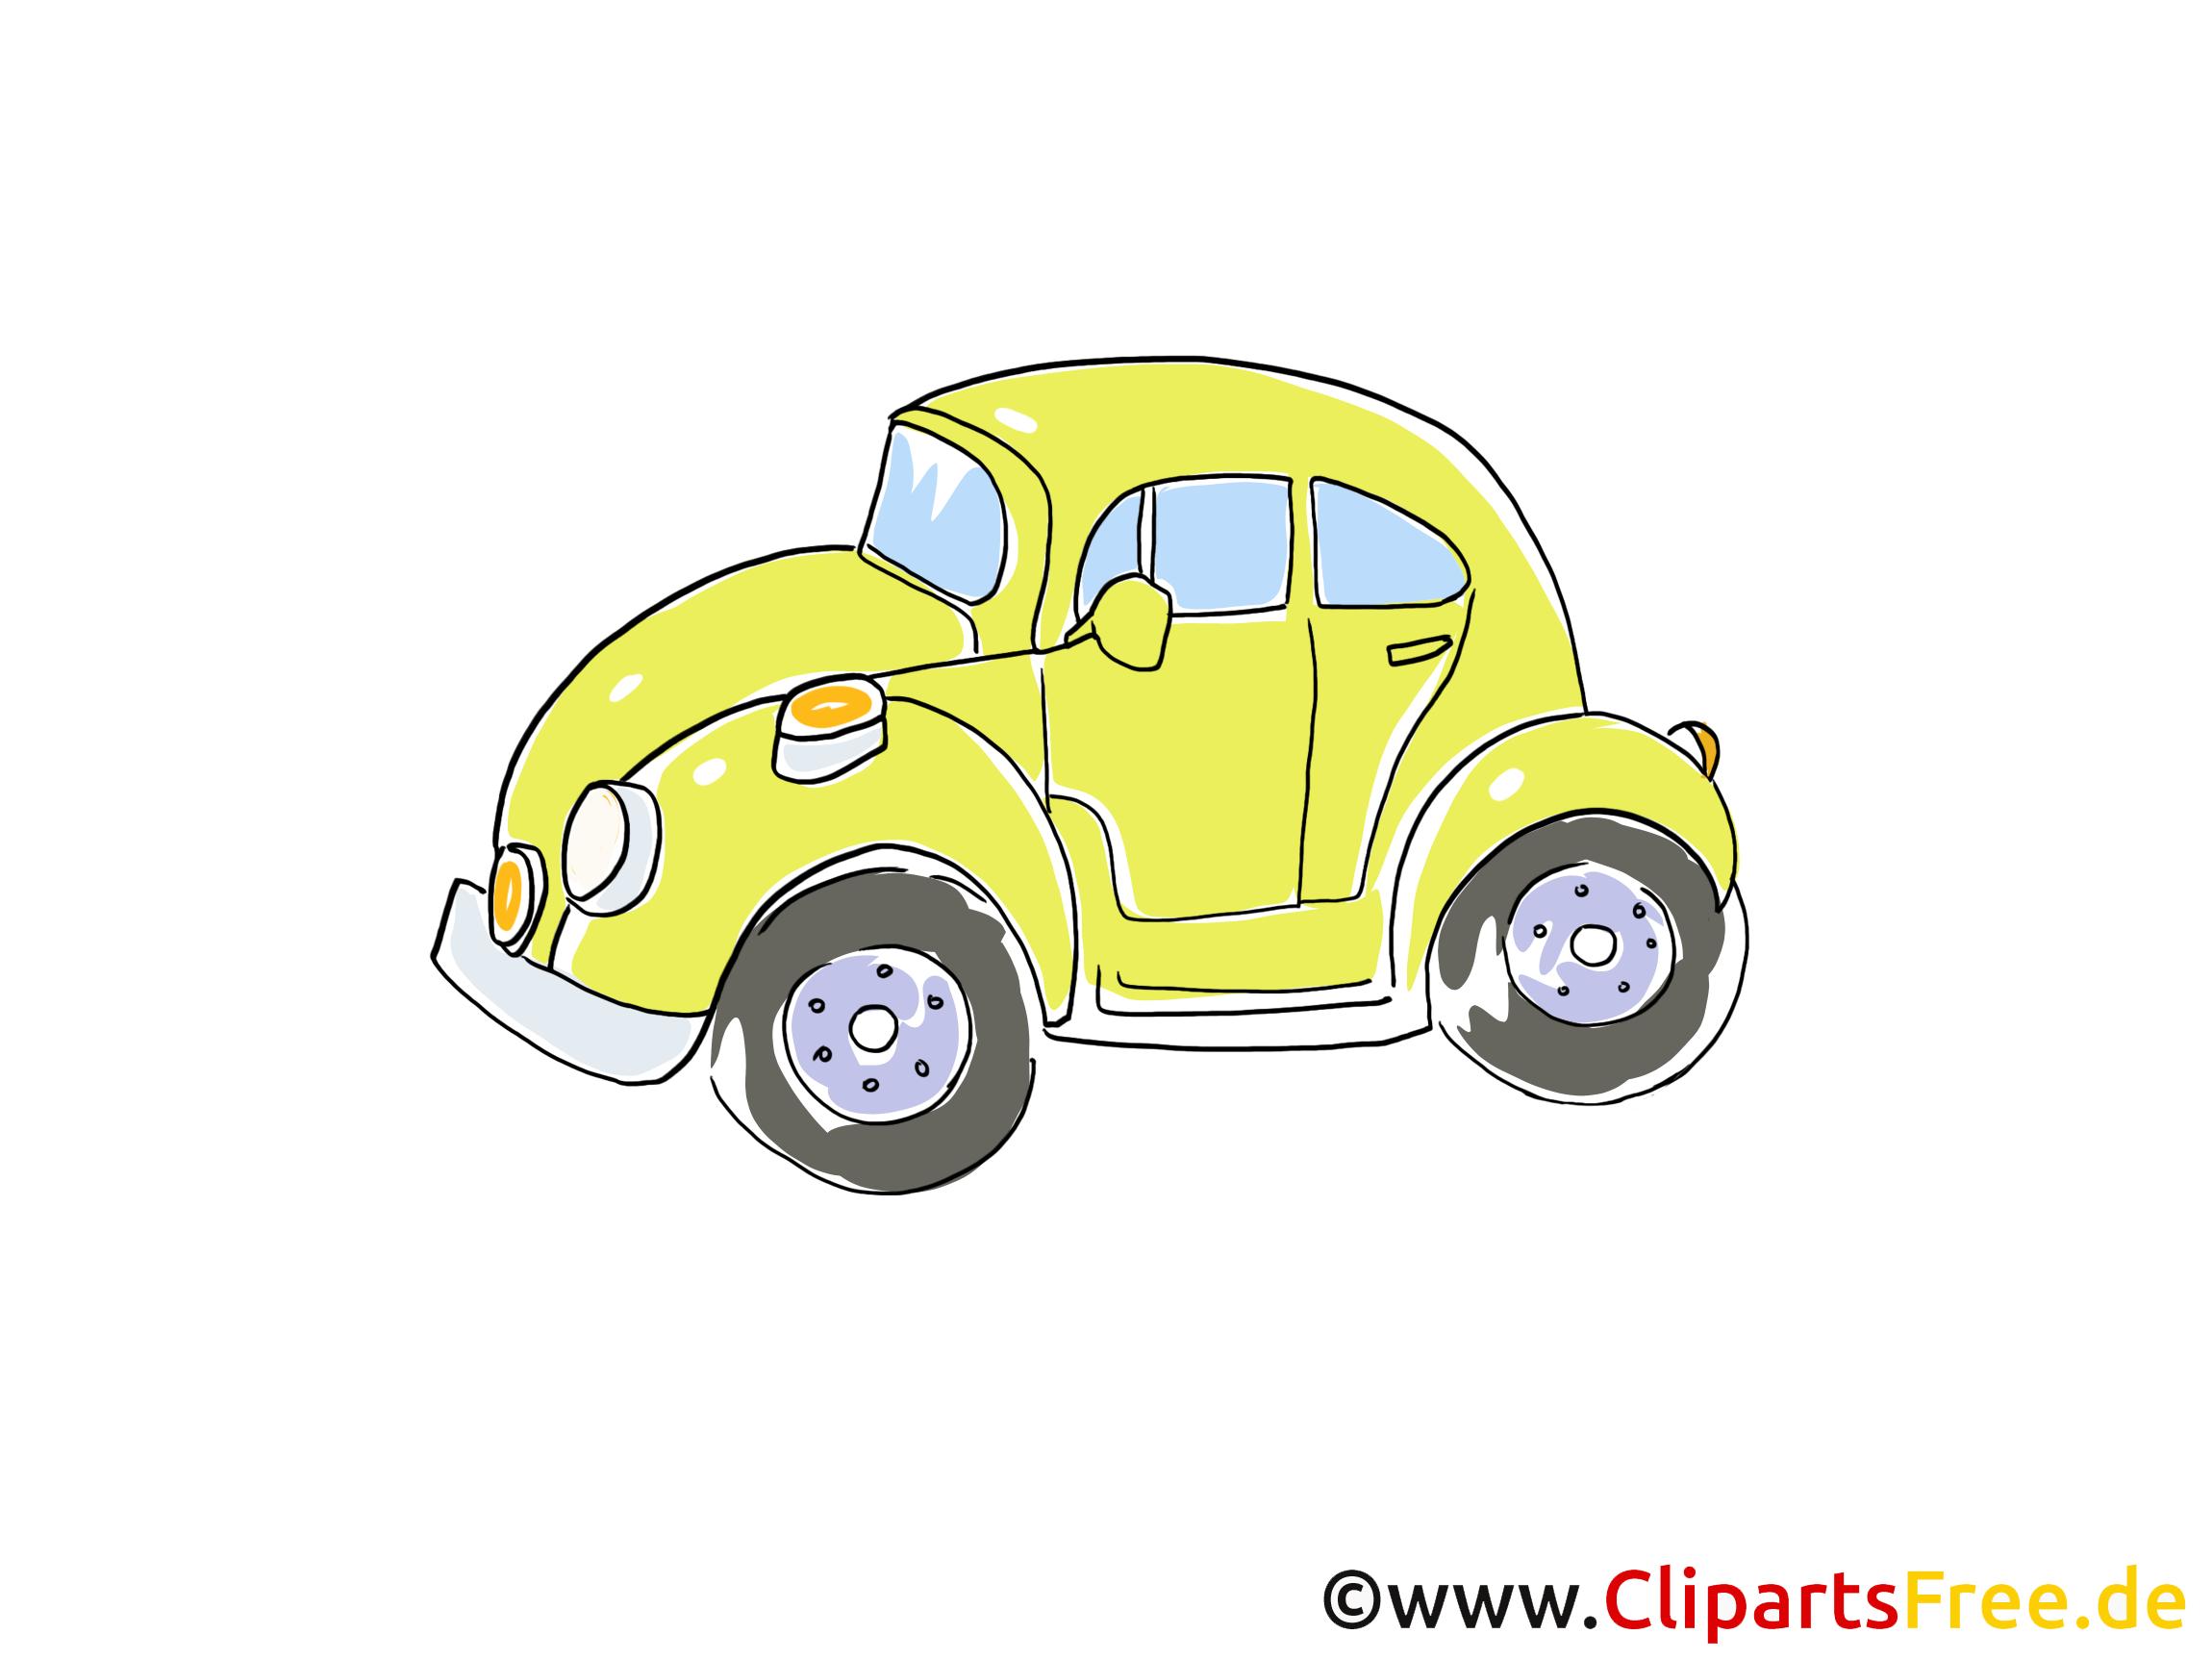 Flitzer Clipart, Bild, Cartoon, Comic, Grafik.